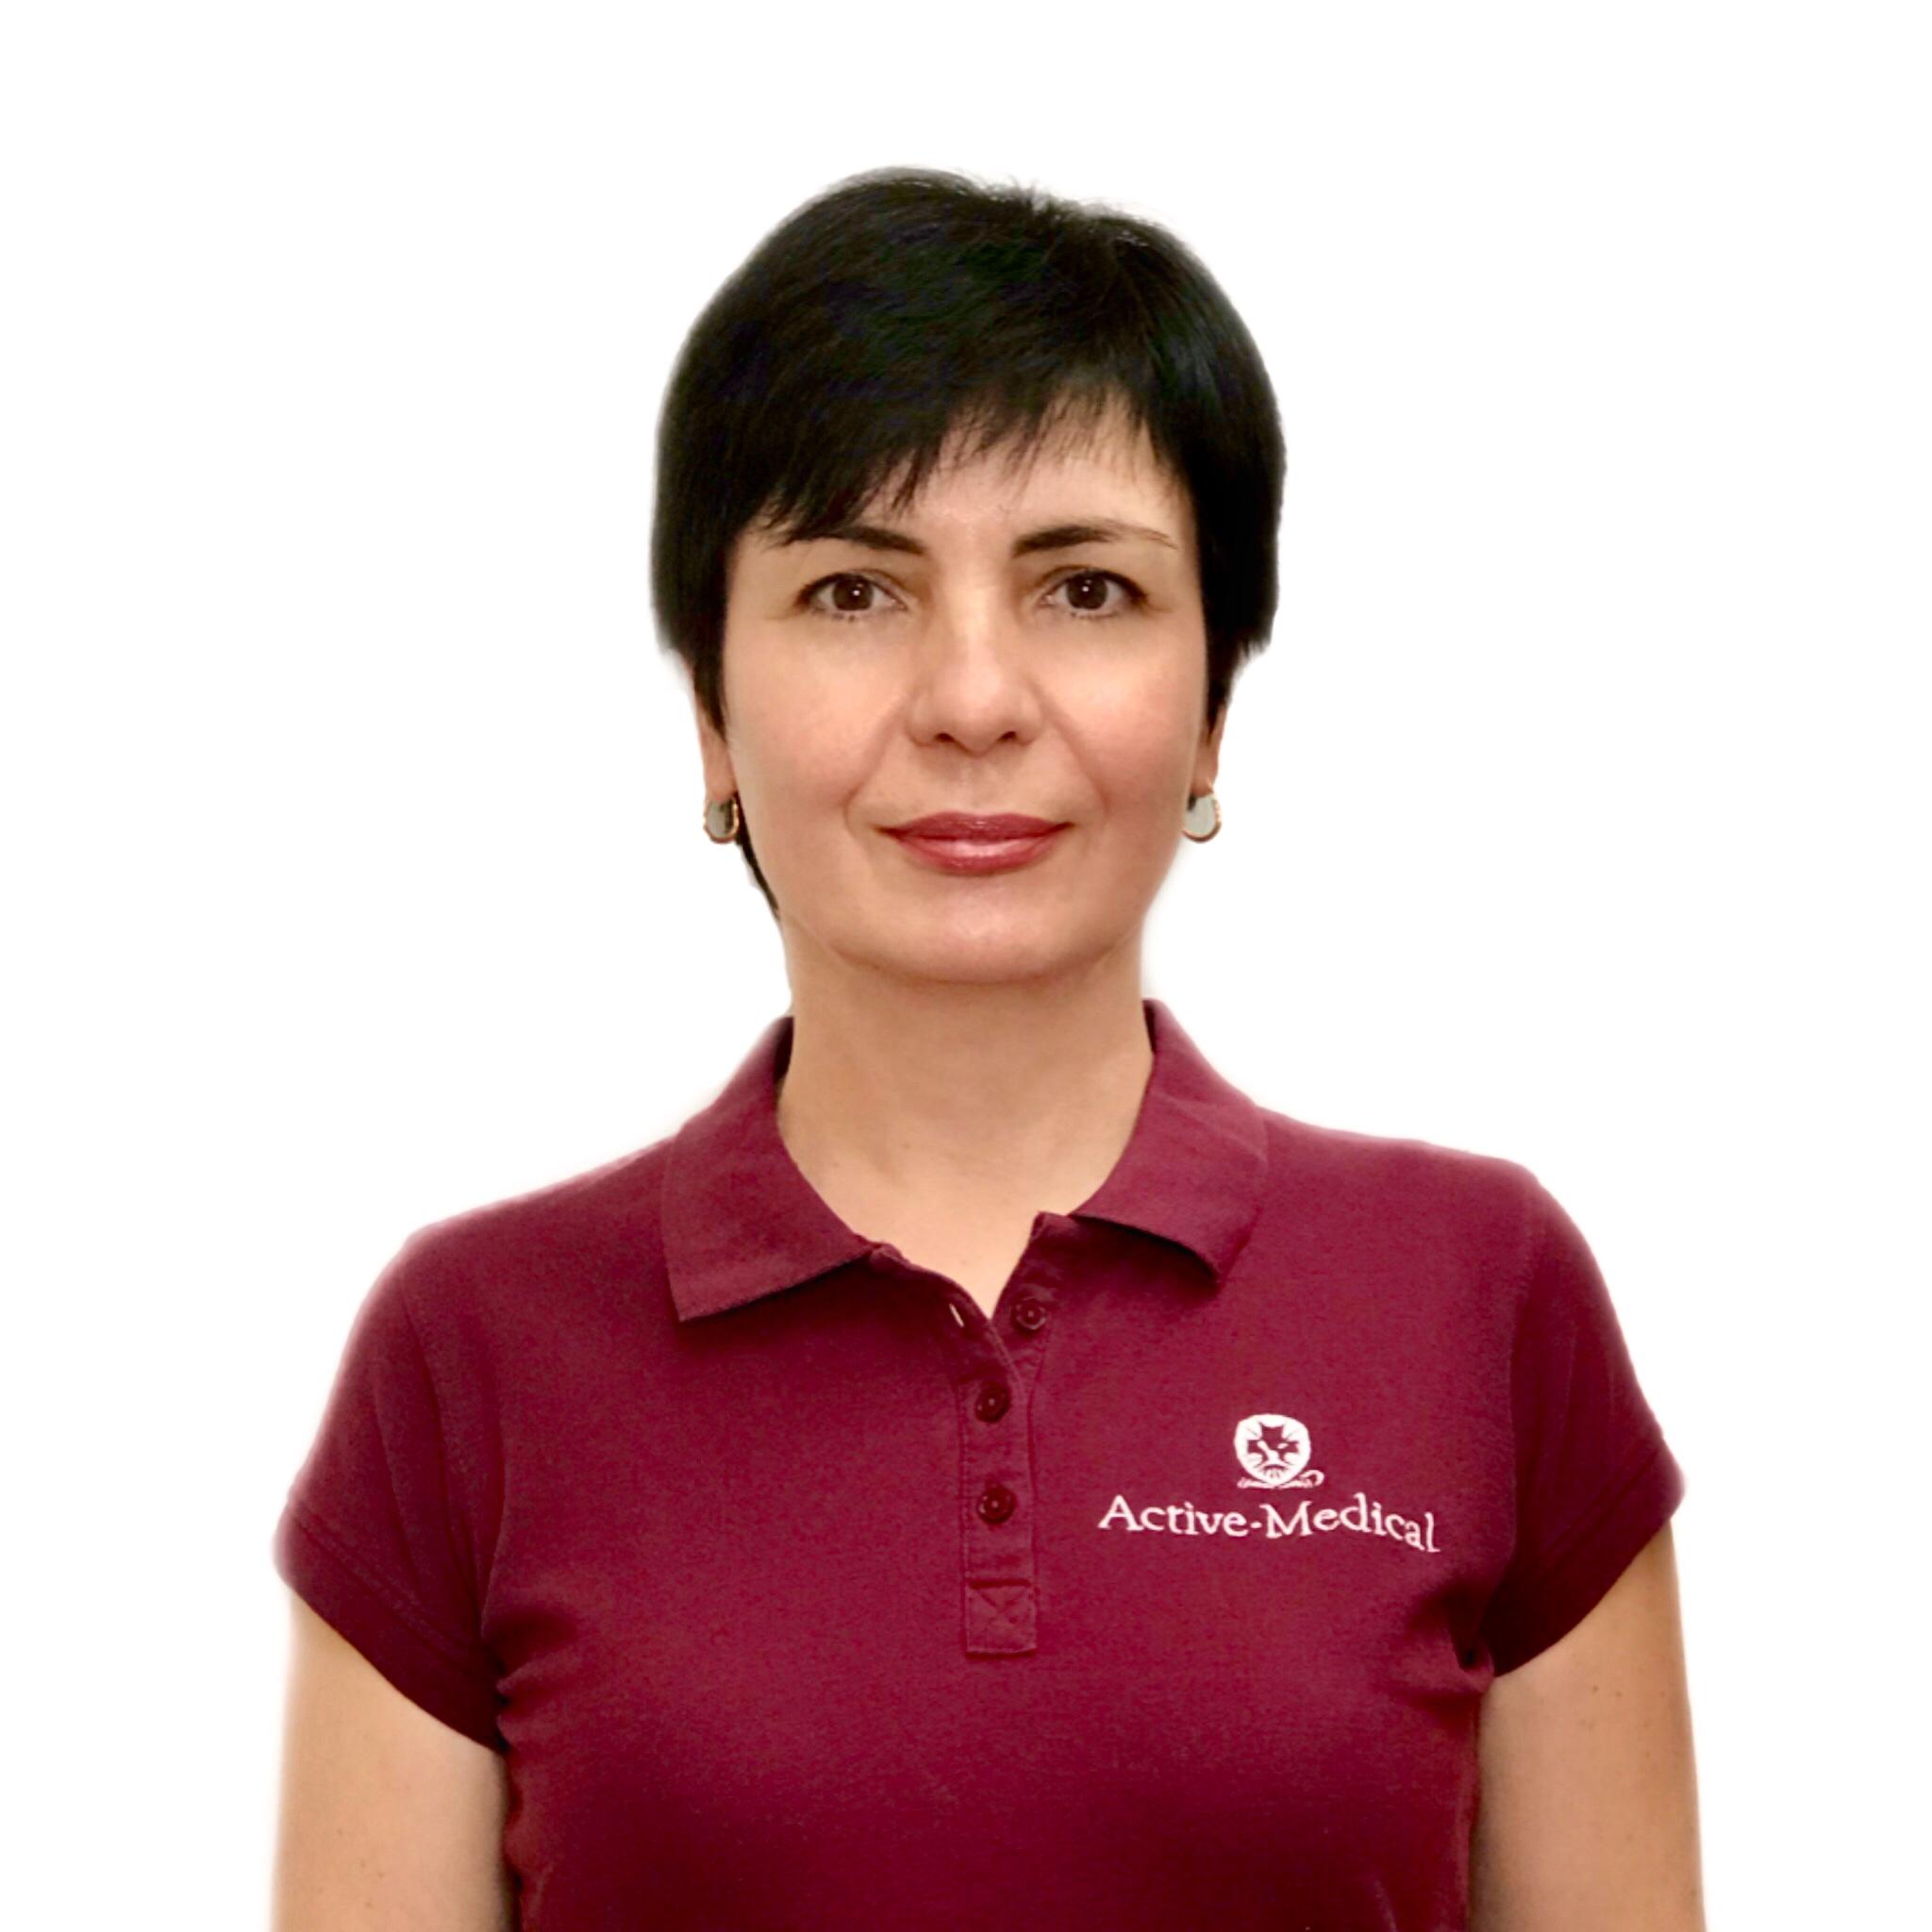 Букач Лариса Владимировна